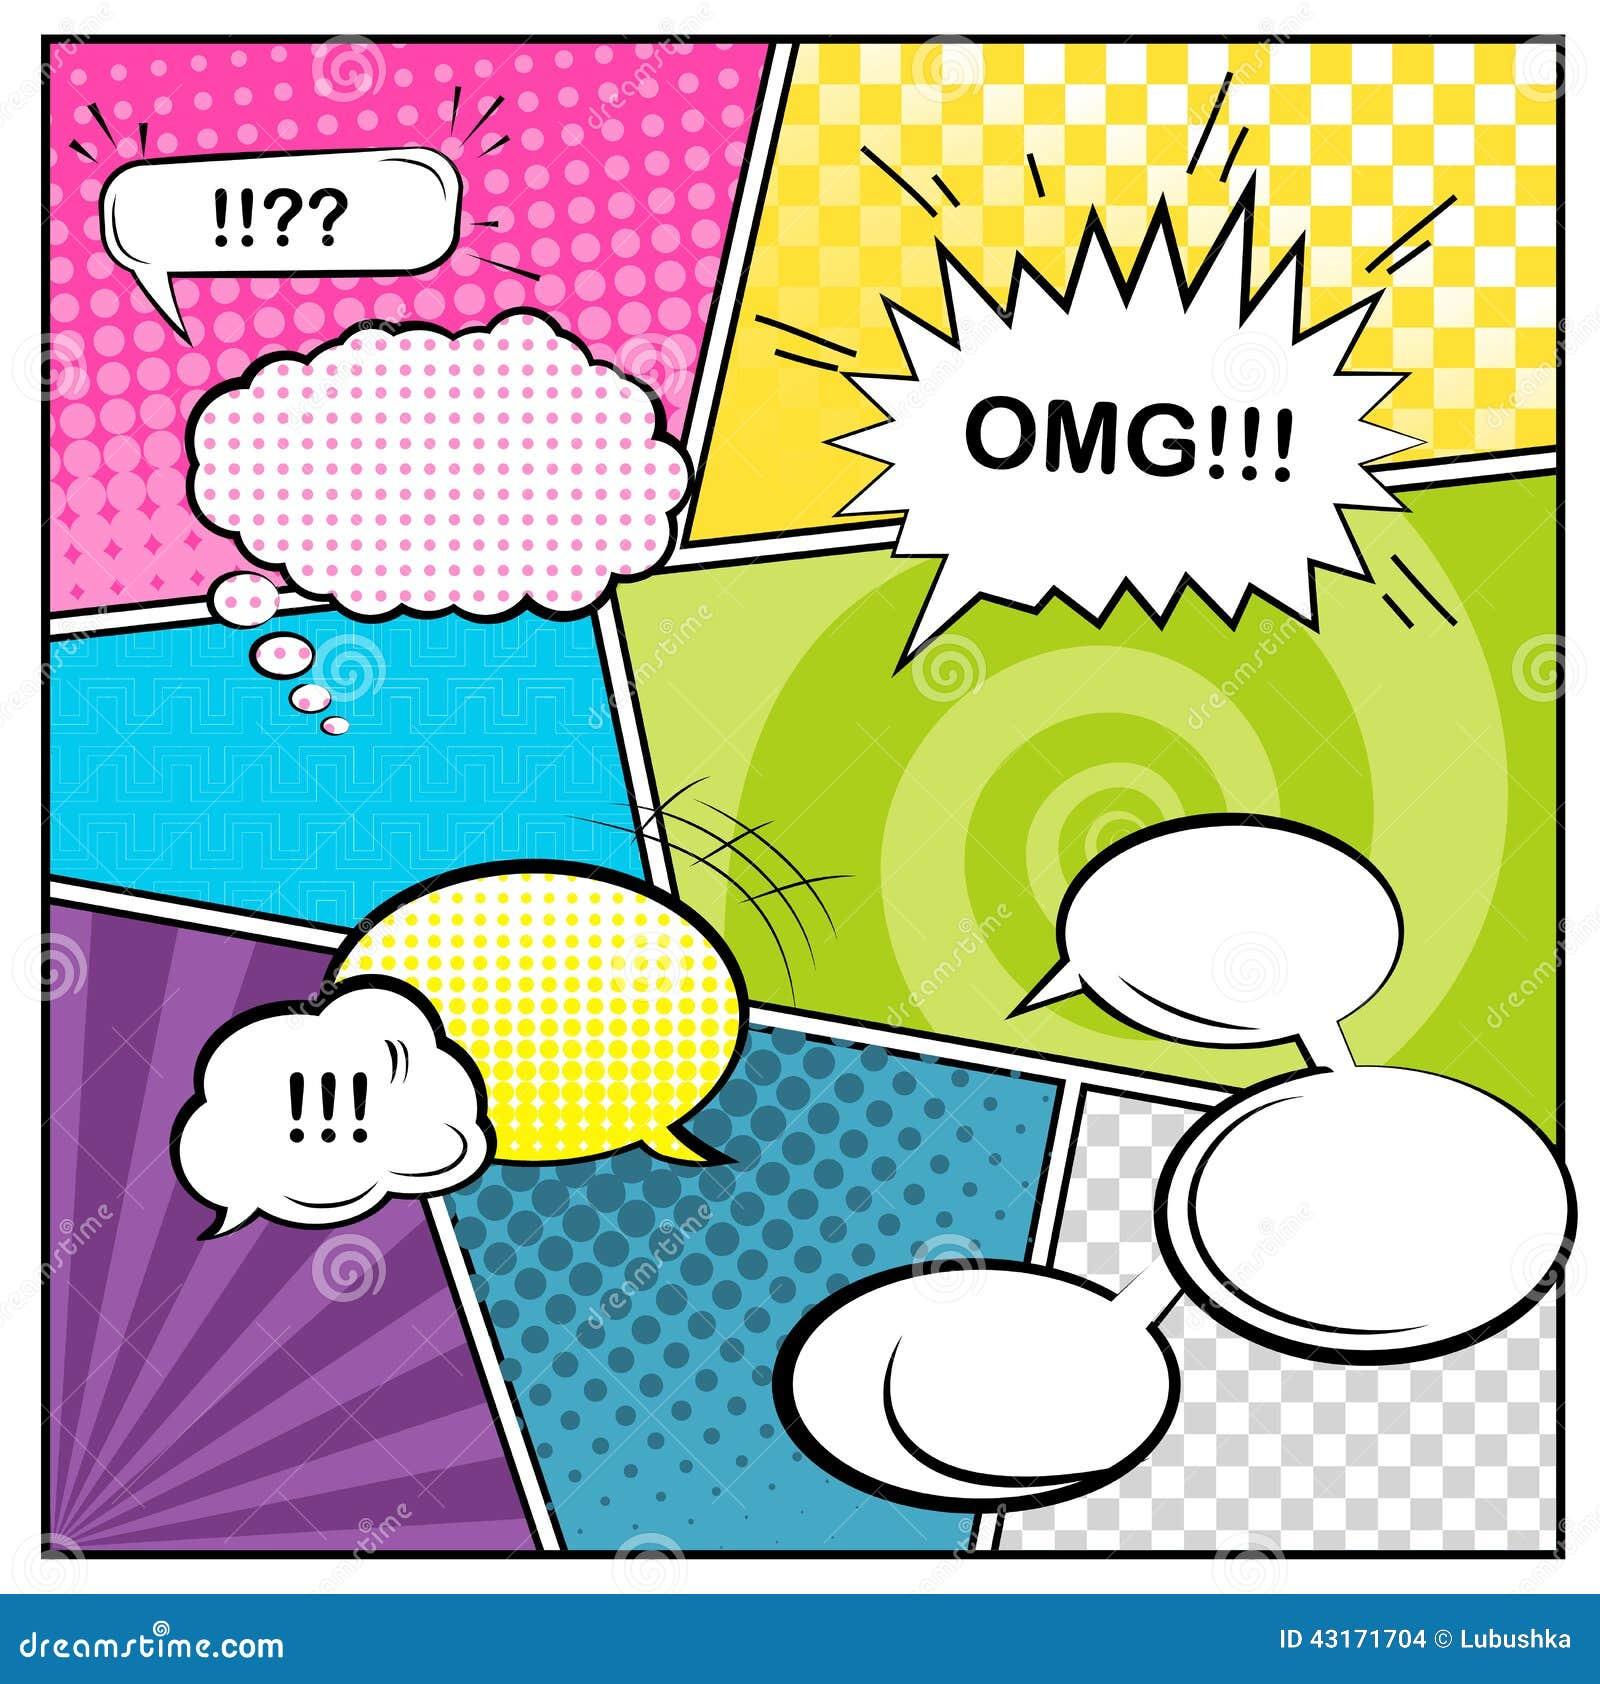 Comics Stock Vector - Image: 43171704: www.dreamstime.com/stock-illustration-comics-vector-template...